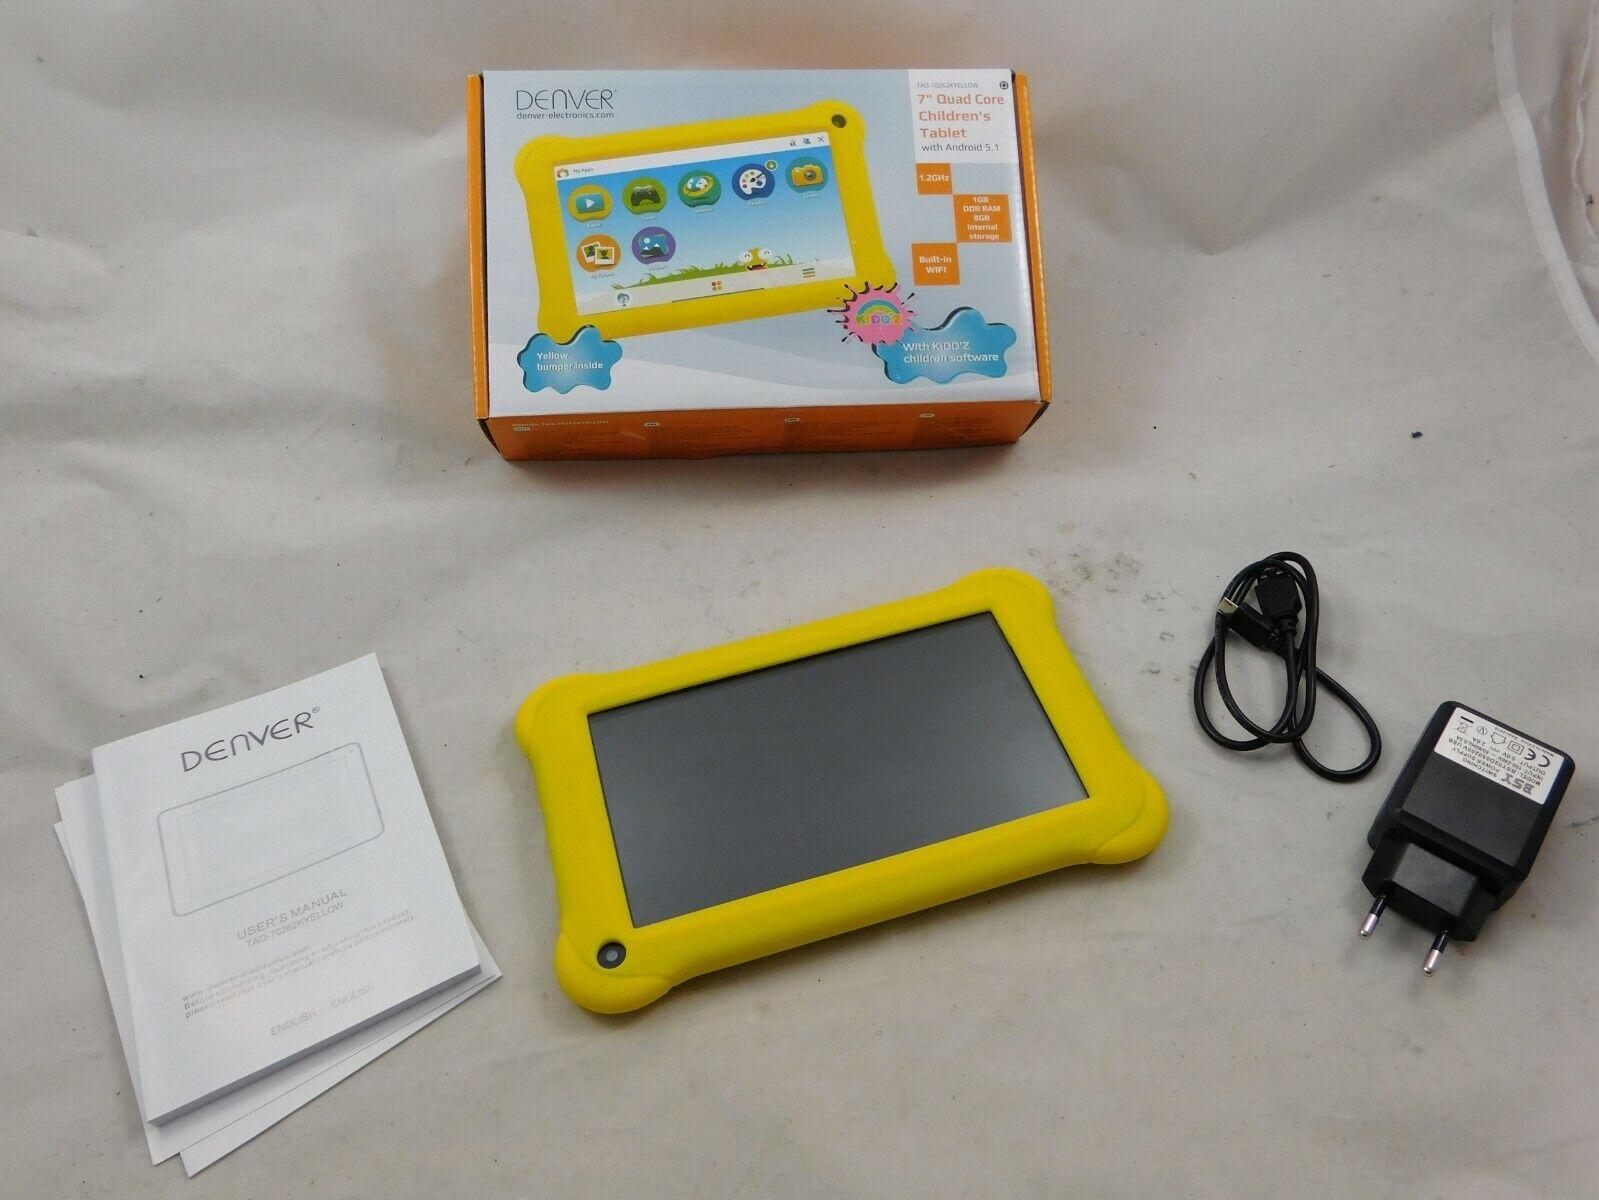 "DENVER Kindertablet TAQ-70262K 17,78 cm ( 7"" ) Tablet 8GB mit Android WLAN c"